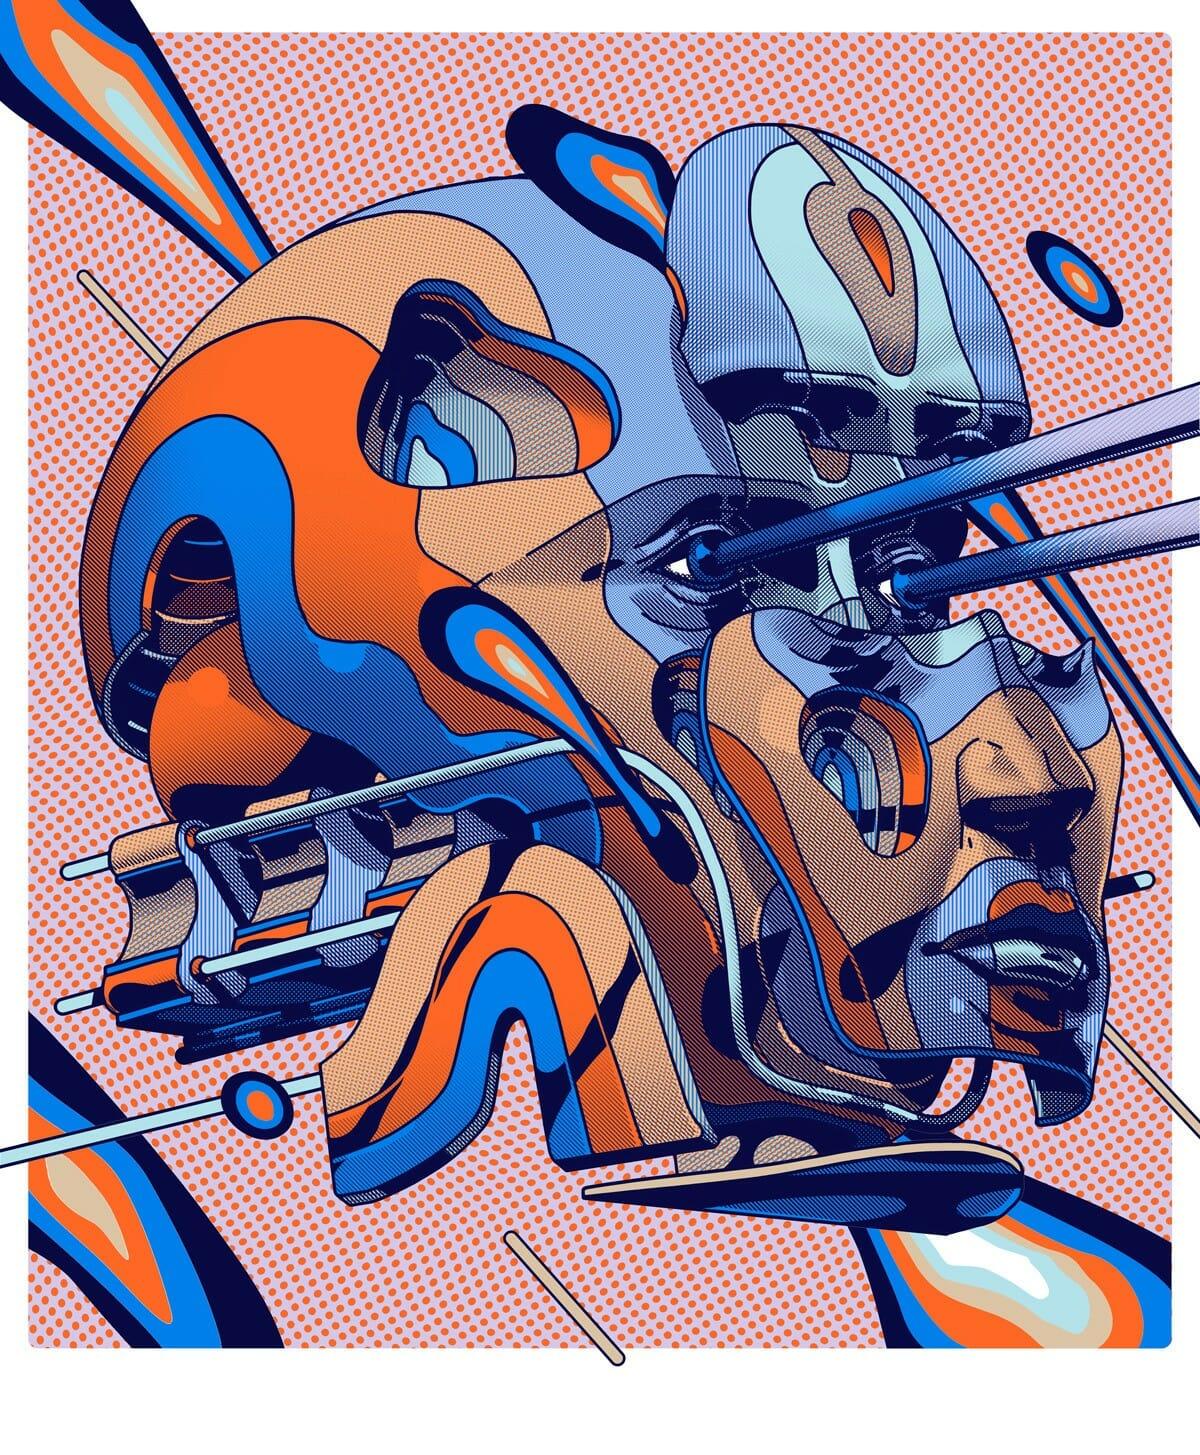 smithe illustration